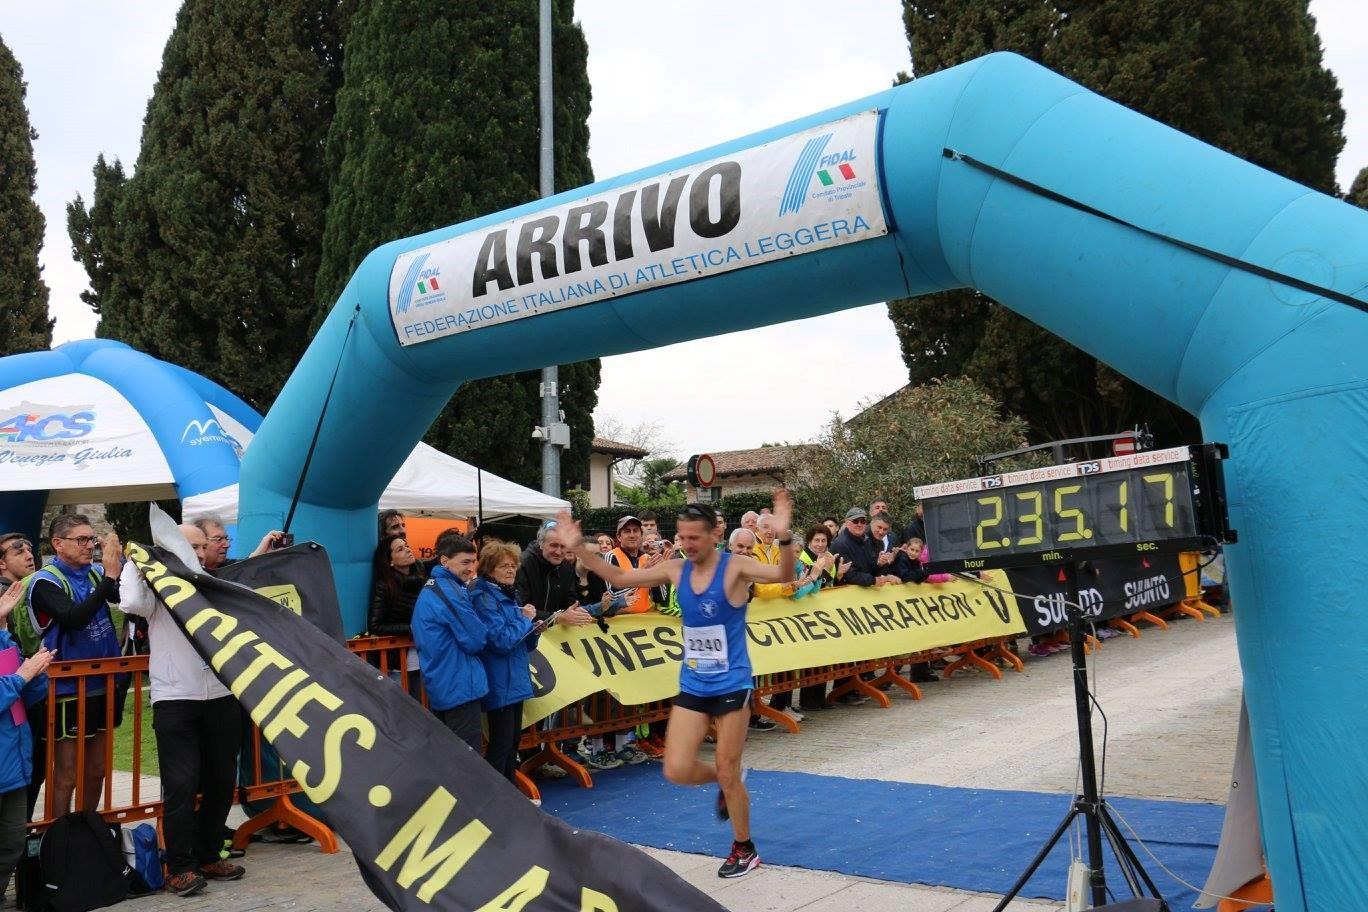 Saverio Giardiello crossing the finish line at the 2017 UNESCO Cities Marathon – © A. Fogar